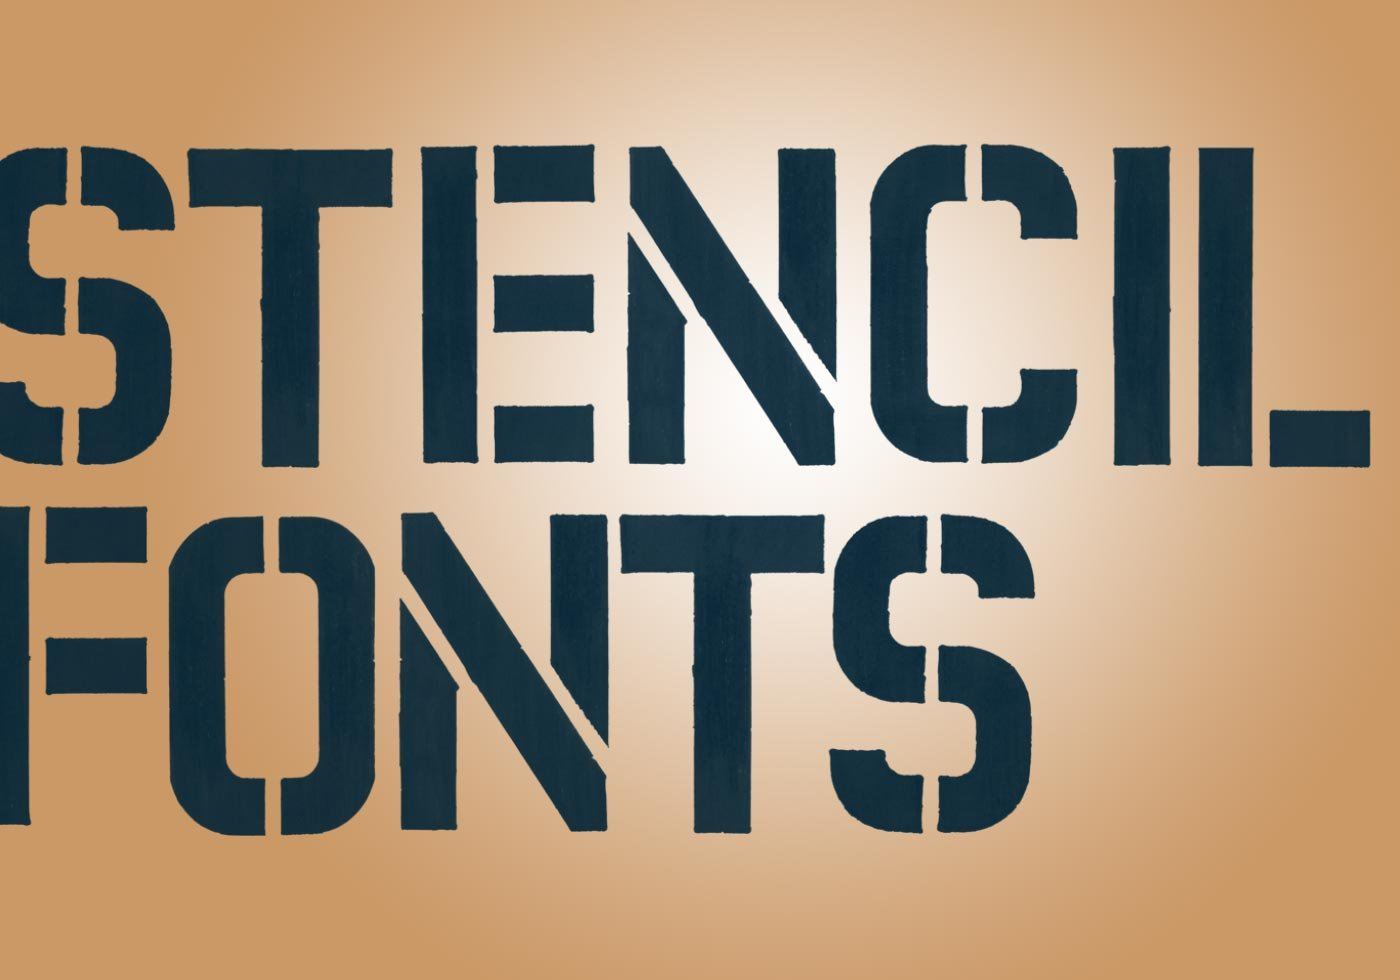 stencil lettering free